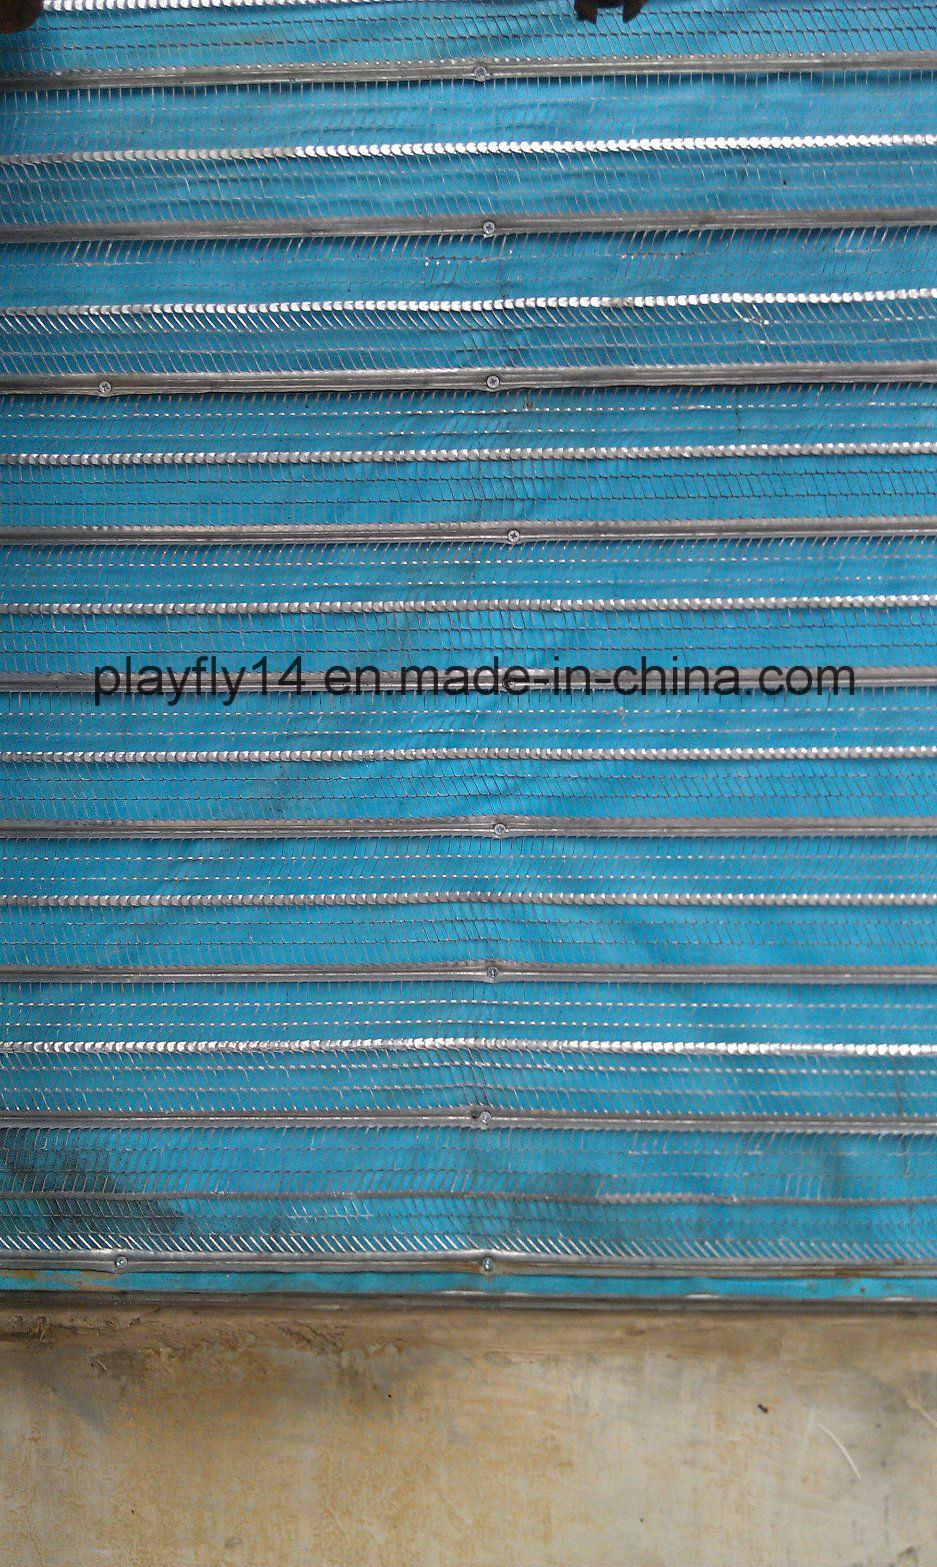 Playfly Accessory U-Shaped Metal Nail